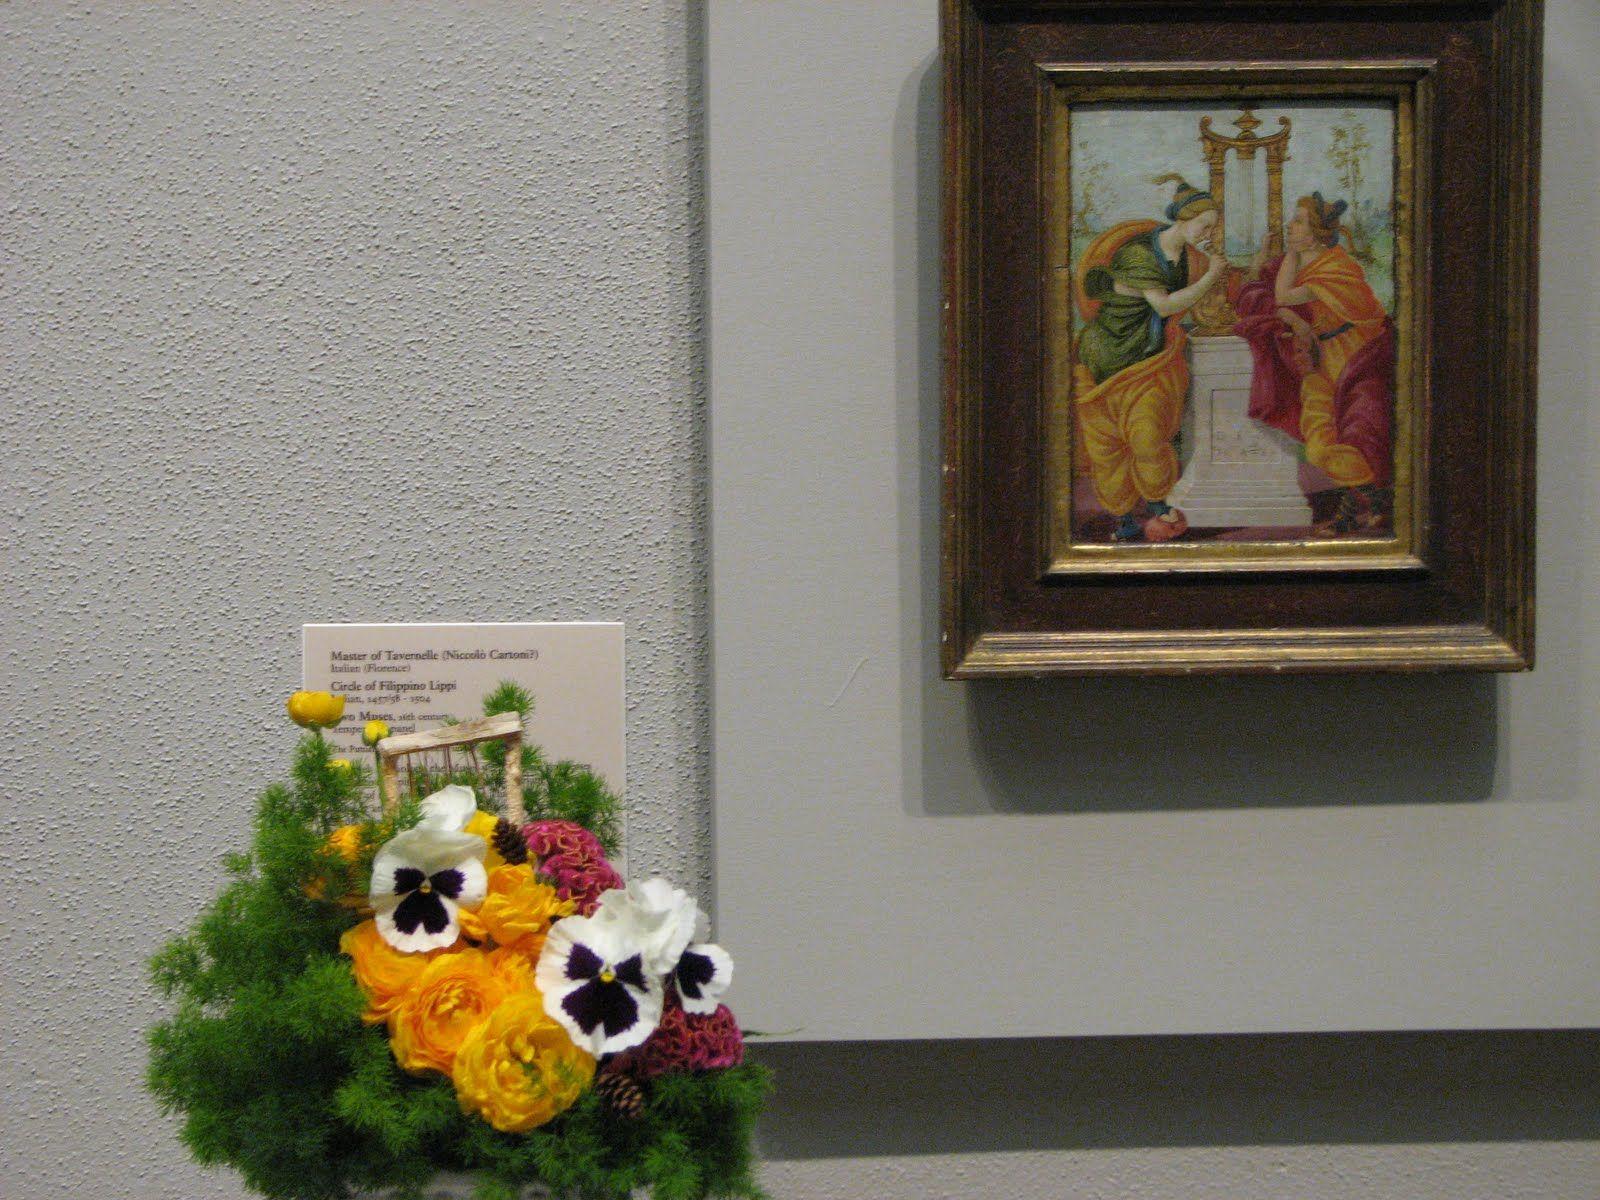 art in bloom 2015 mia - Google Search